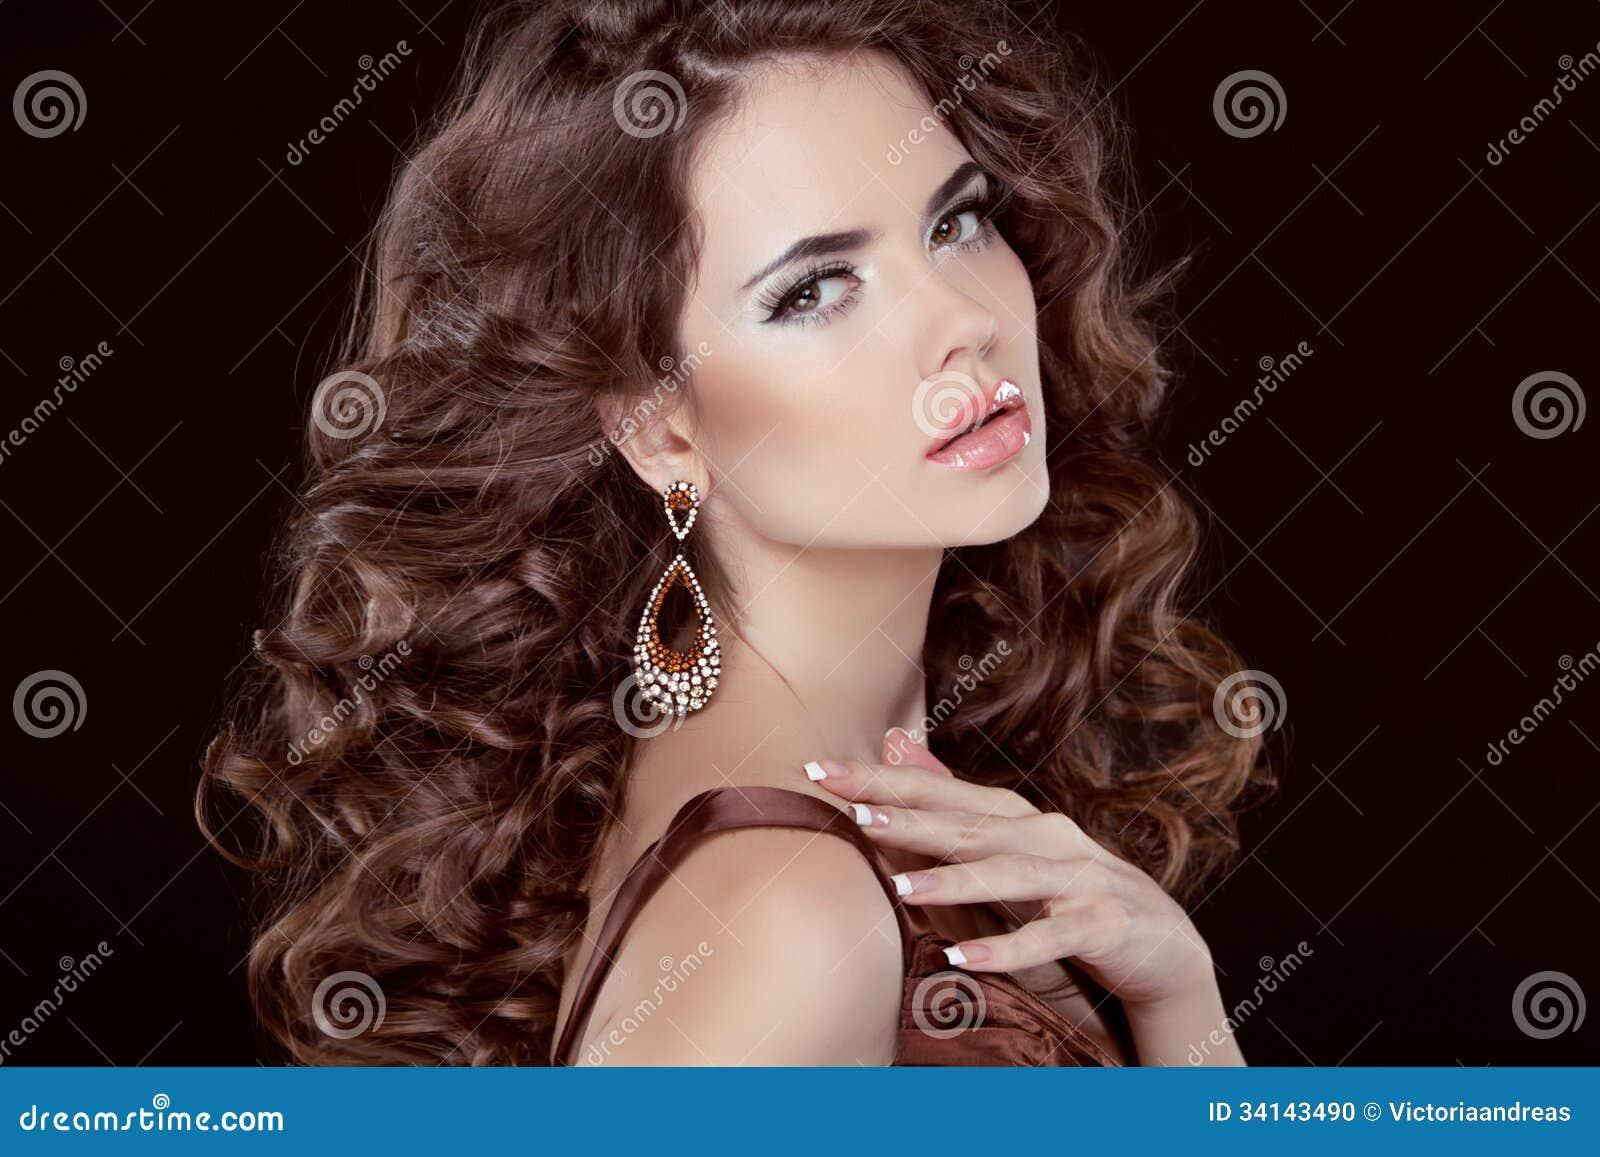 Pelo Ondulado Mujer Morena Atractiva Hermosa Pelo Largo